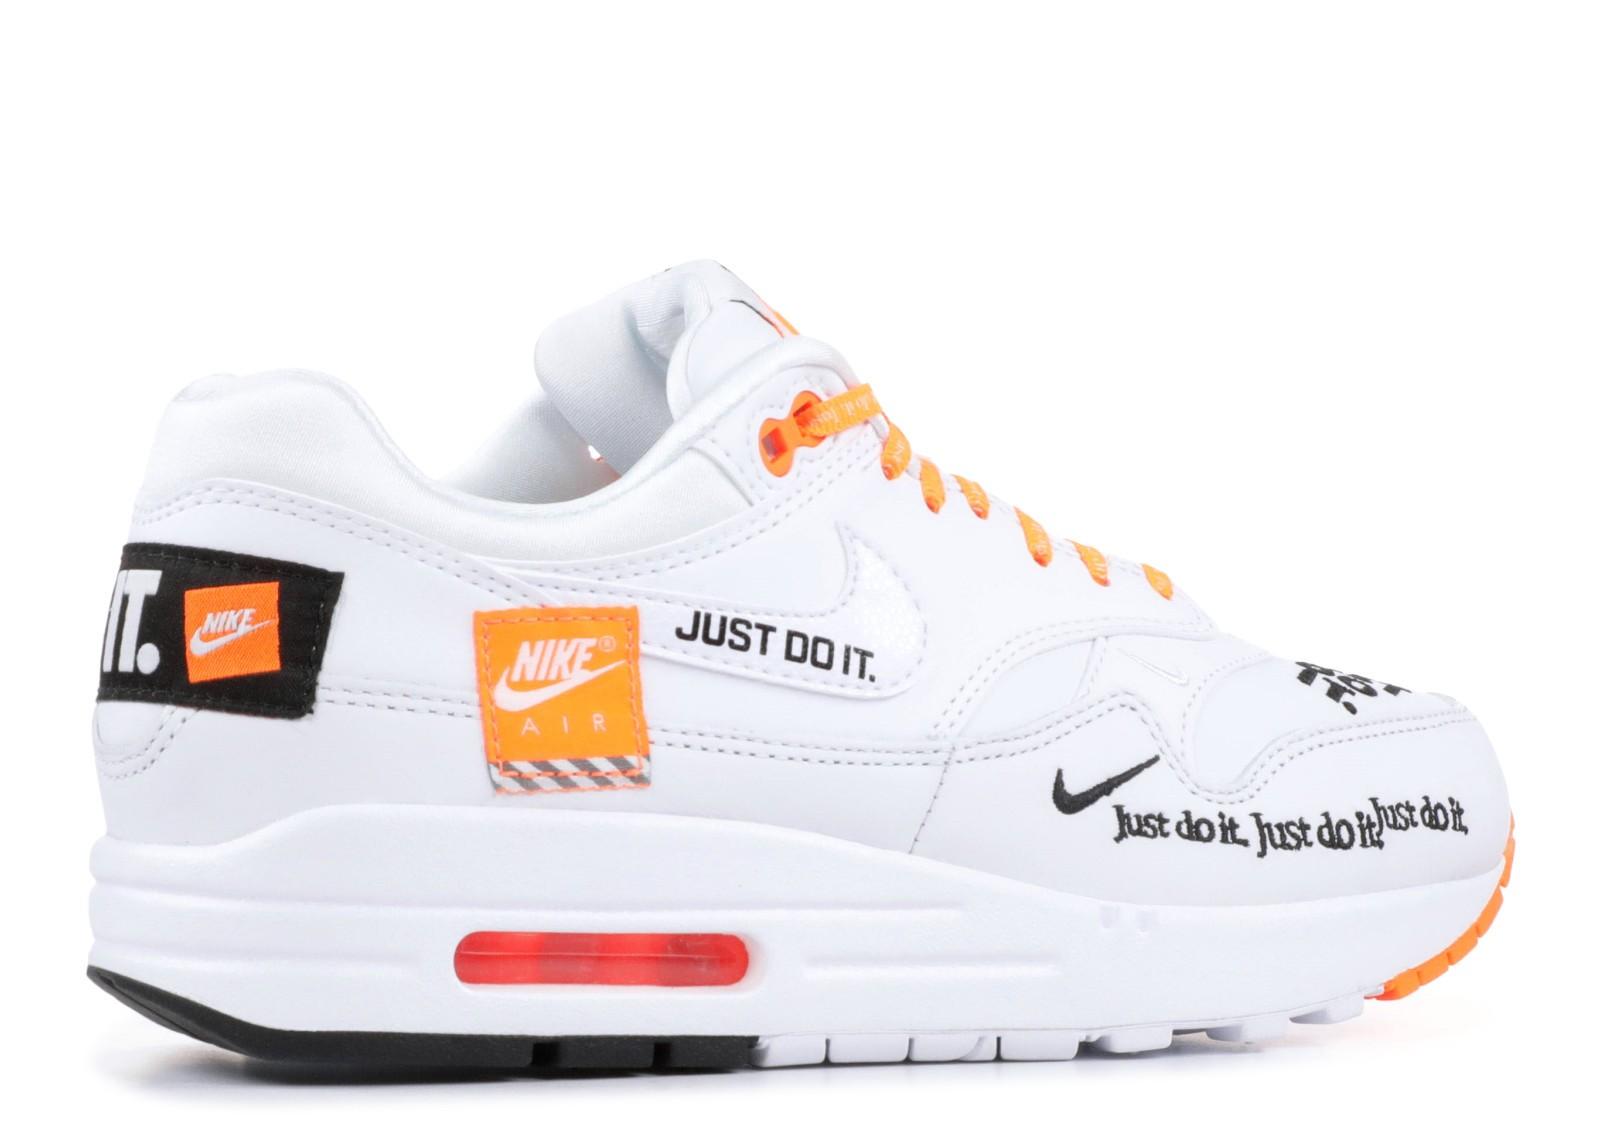 Air Black Orange Wmns 100 Max 1 Just 917691 It White Do Total Lx 7y6Yfbg